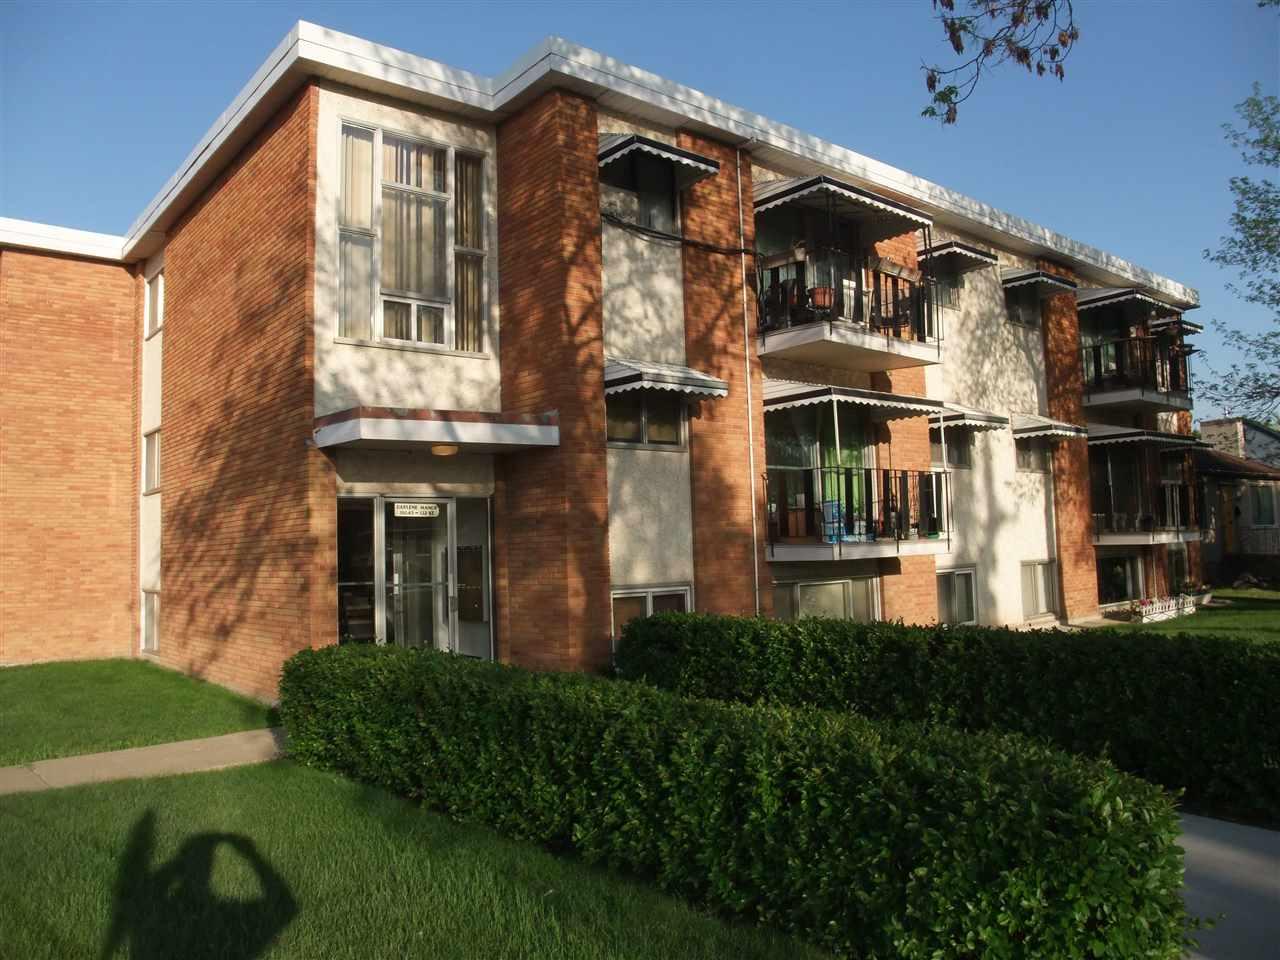 For Sale: 11045 132 Street, Edmonton, AB   1 Bed, 1 Bath Condo for $114,500. See 21 photos!